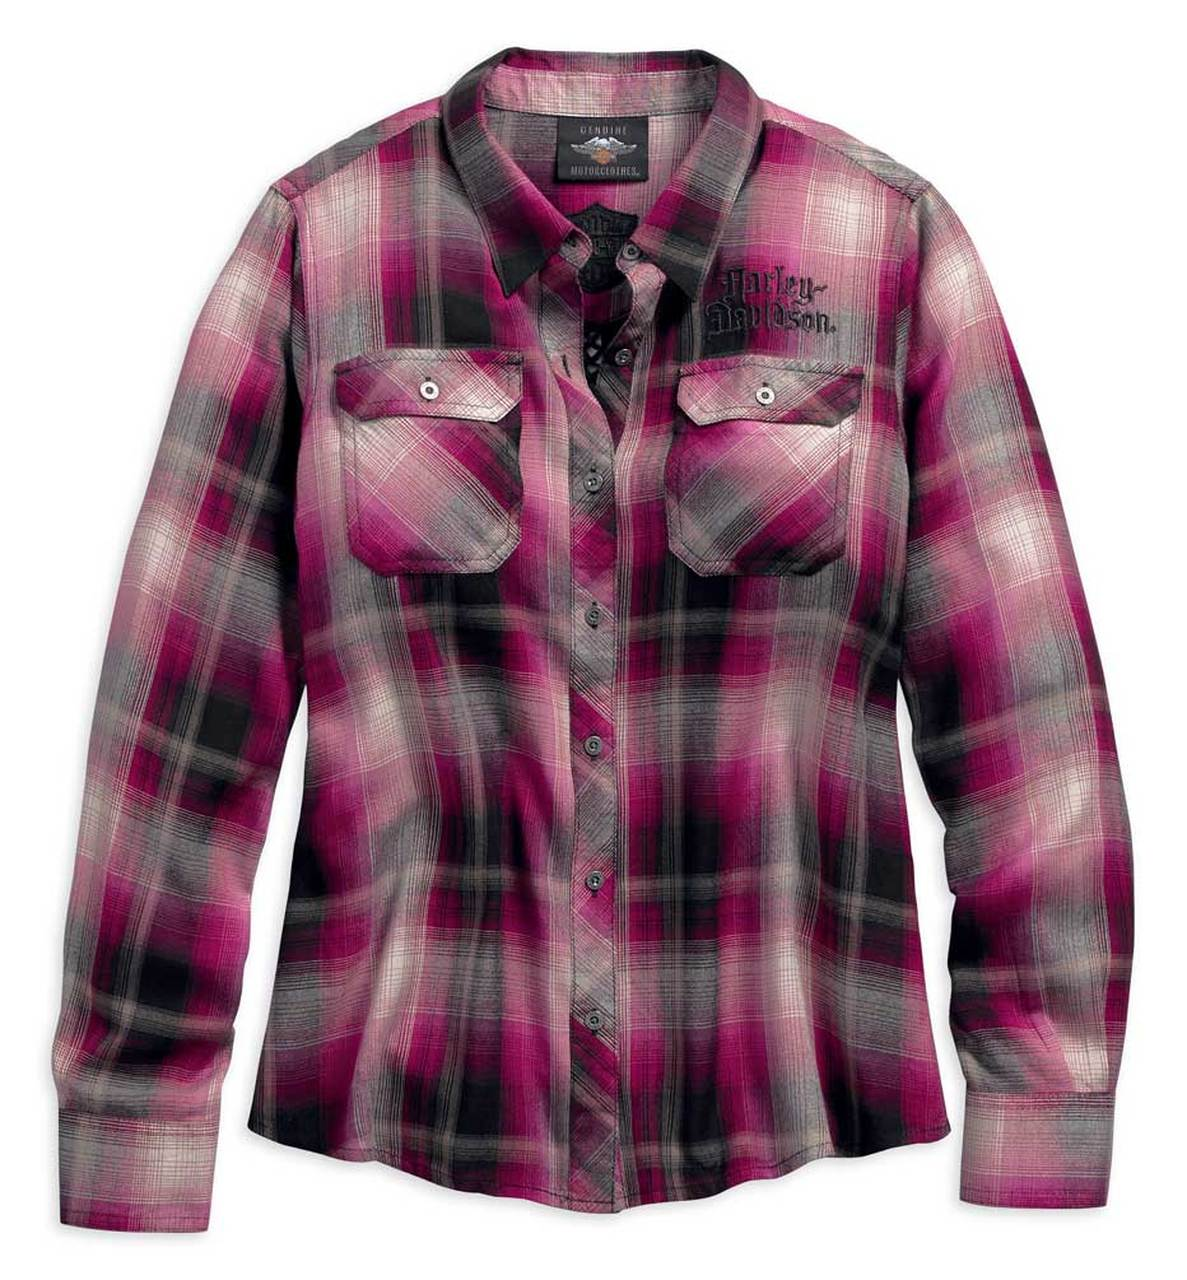 Harley-Davidson® Women's Hearts & Serpents Laced Plaid Shirt, Pink